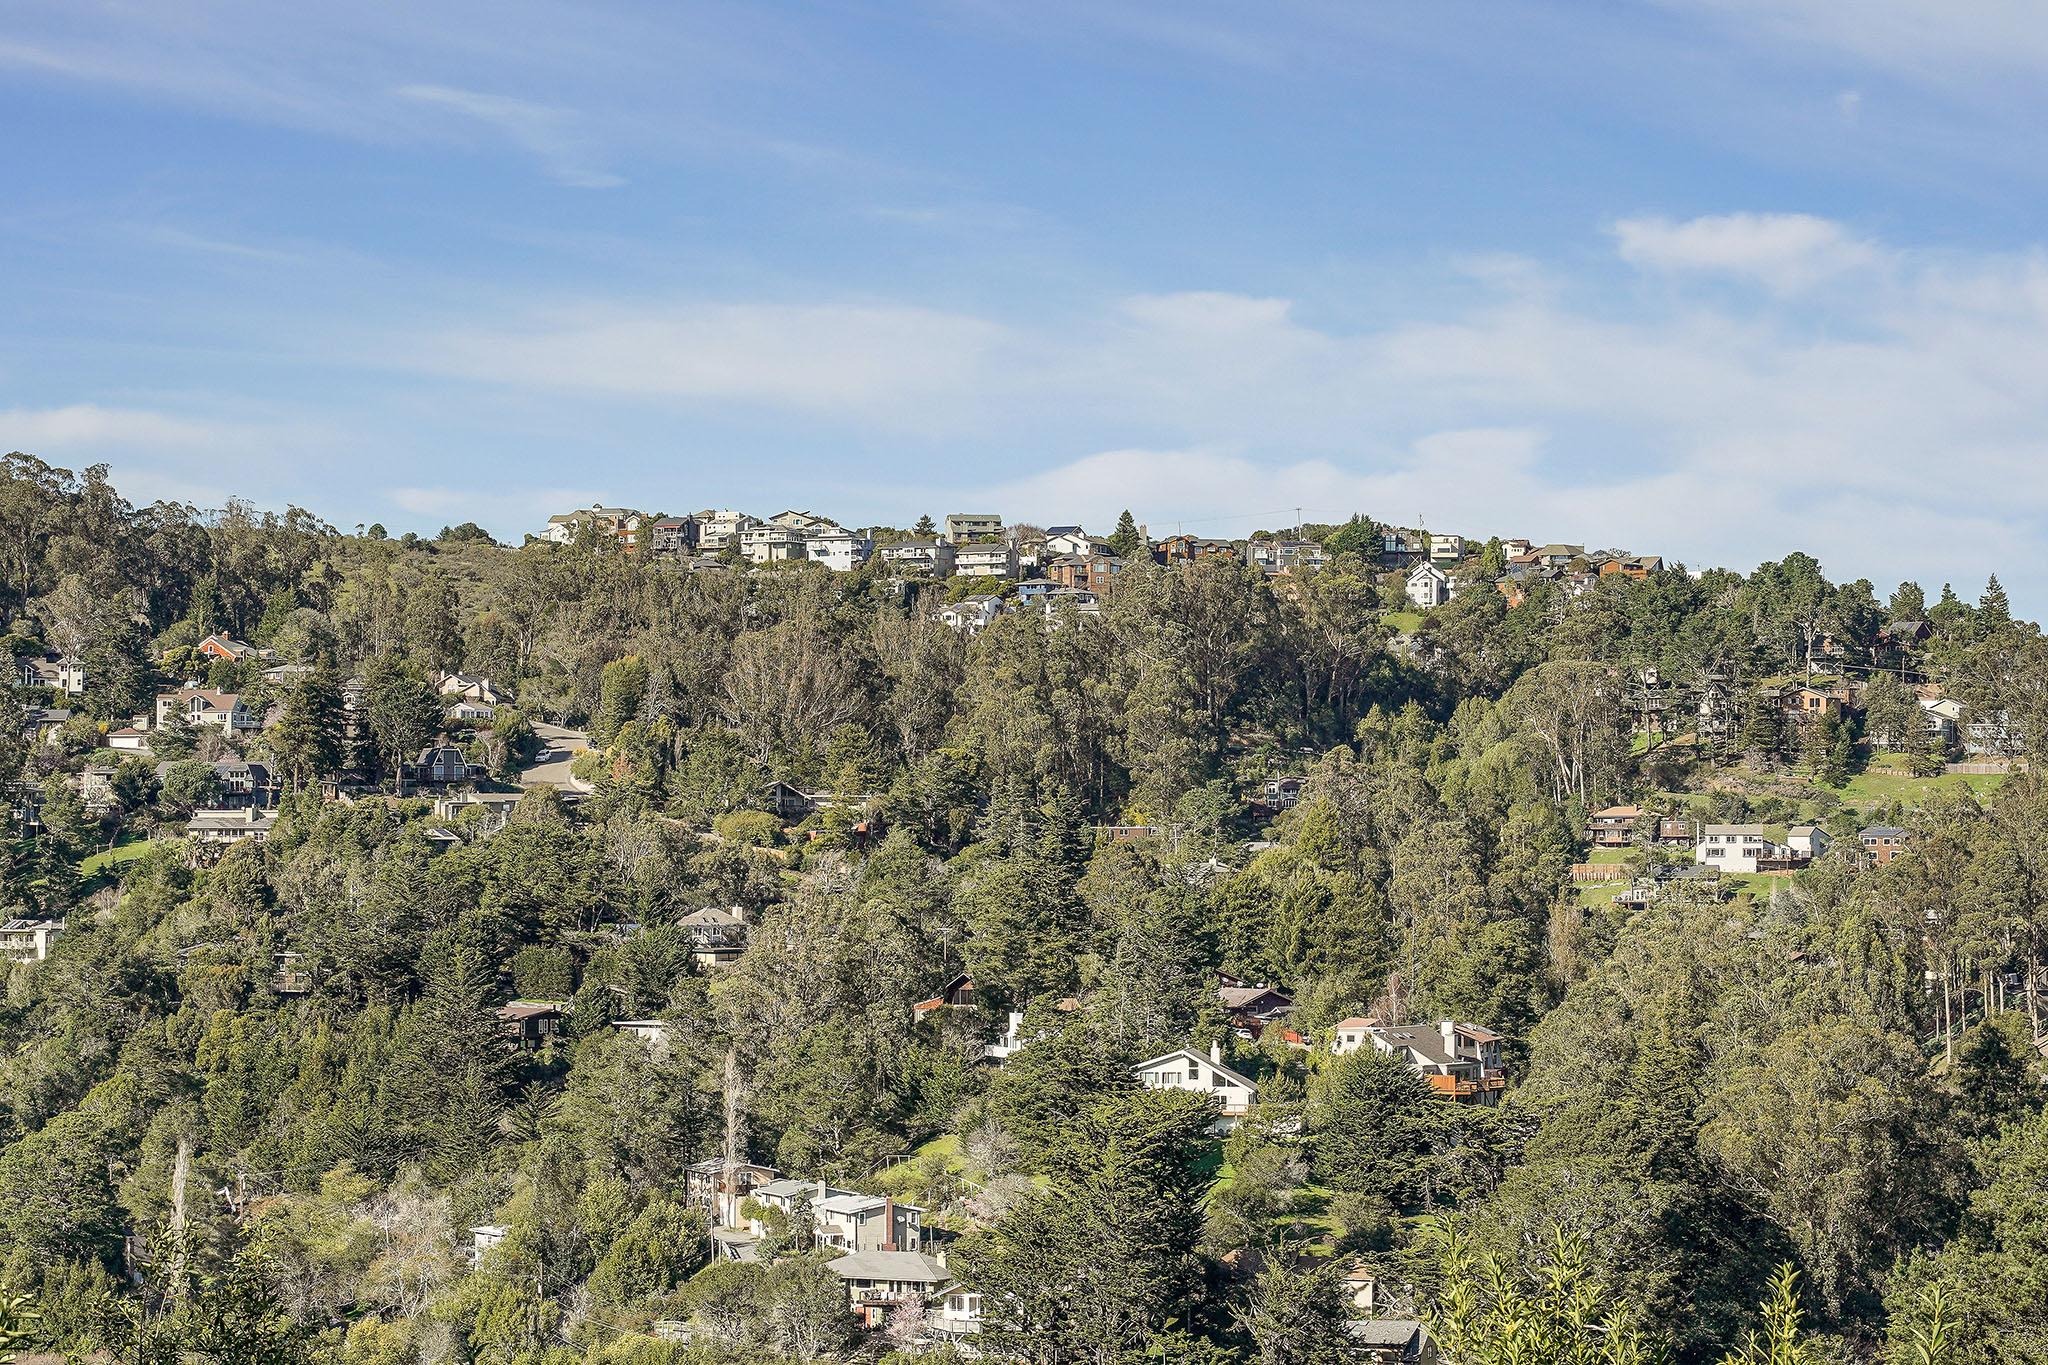 Views 3 - Hills.jpg